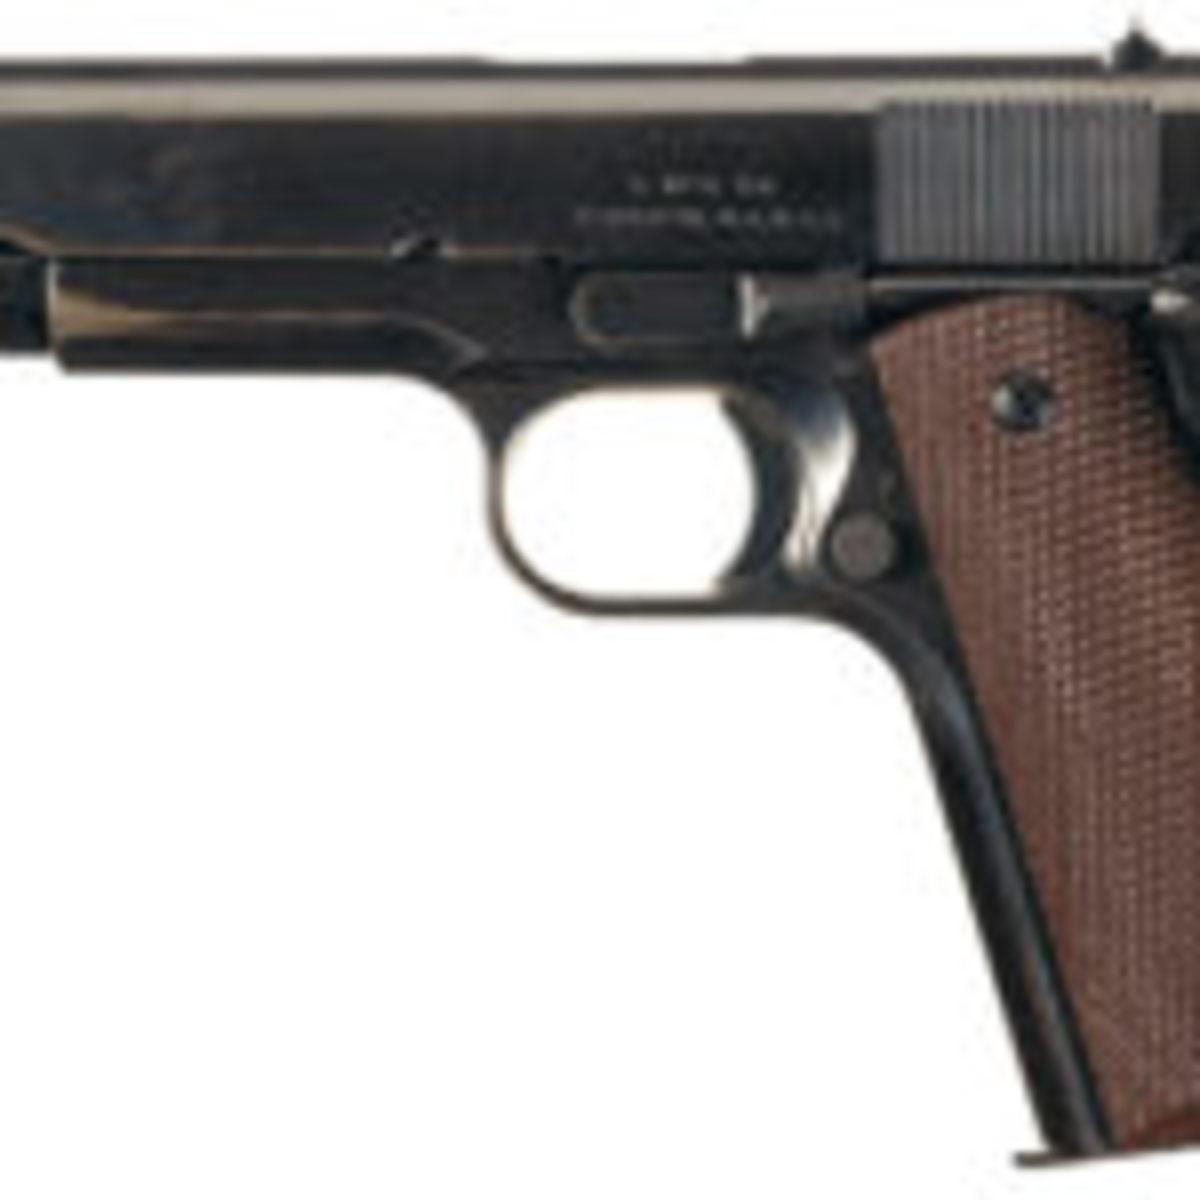 Rare World War II Singer Manufacturing Company U.S. Model 1911A1 semi-automatic pistol. Photo courtesy Rock Island Auction Co.